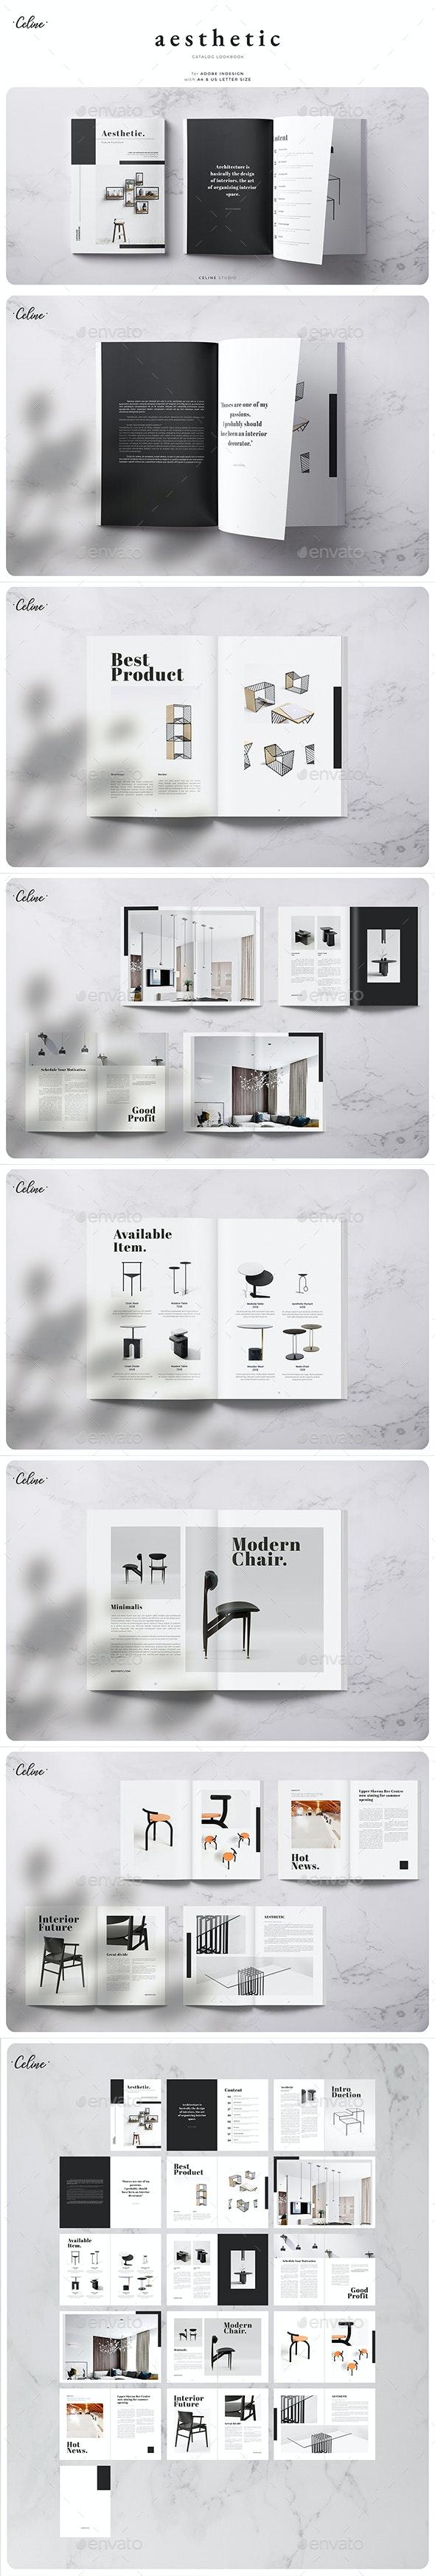 Aesthetic - Catalog Template - Magazines Print Templates